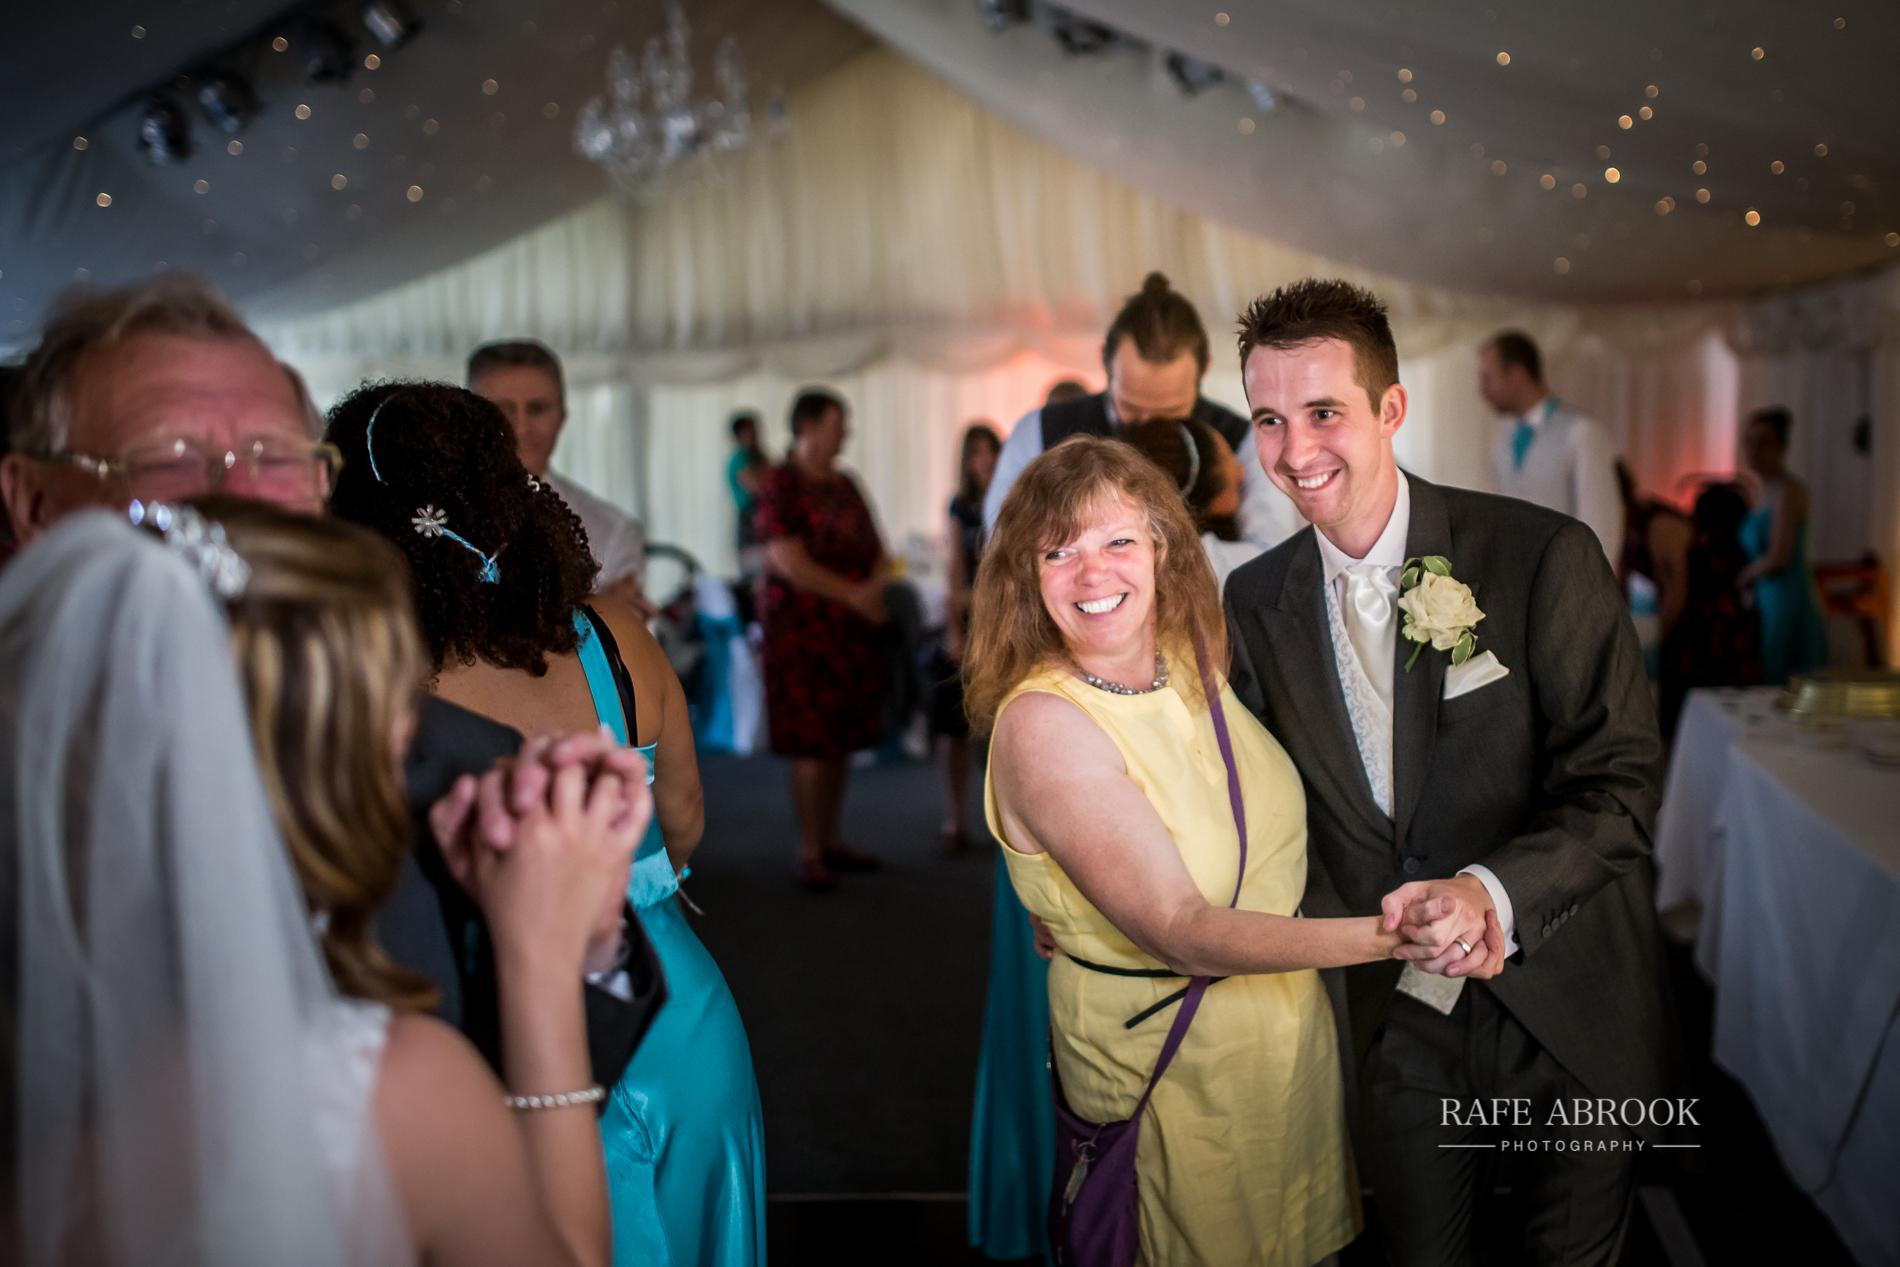 wedding photographer hertfordshire noke thistle hotel st albans -1443.jpg